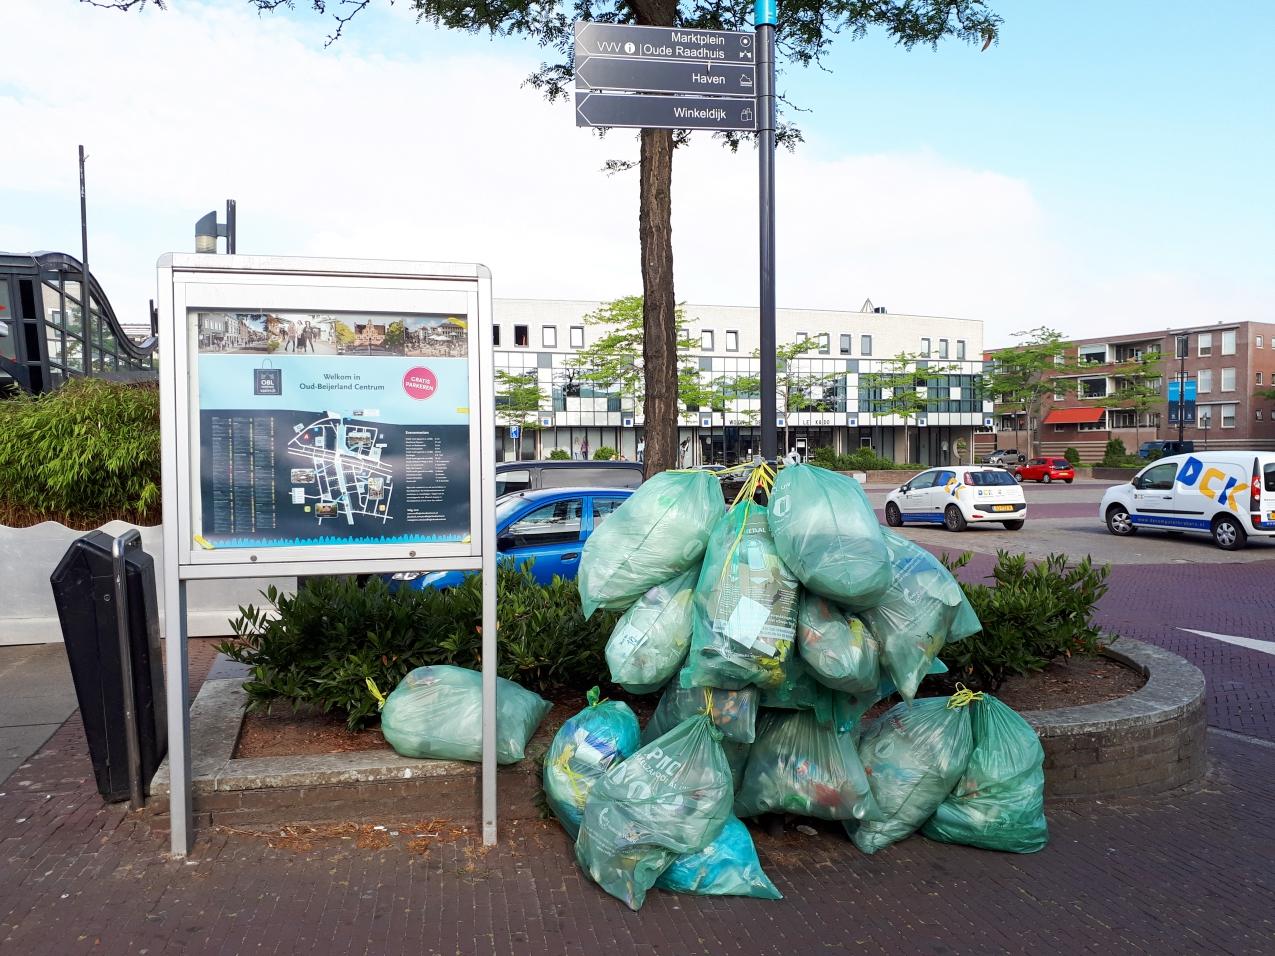 pmd-zakken-plastic-afval-inzamelen